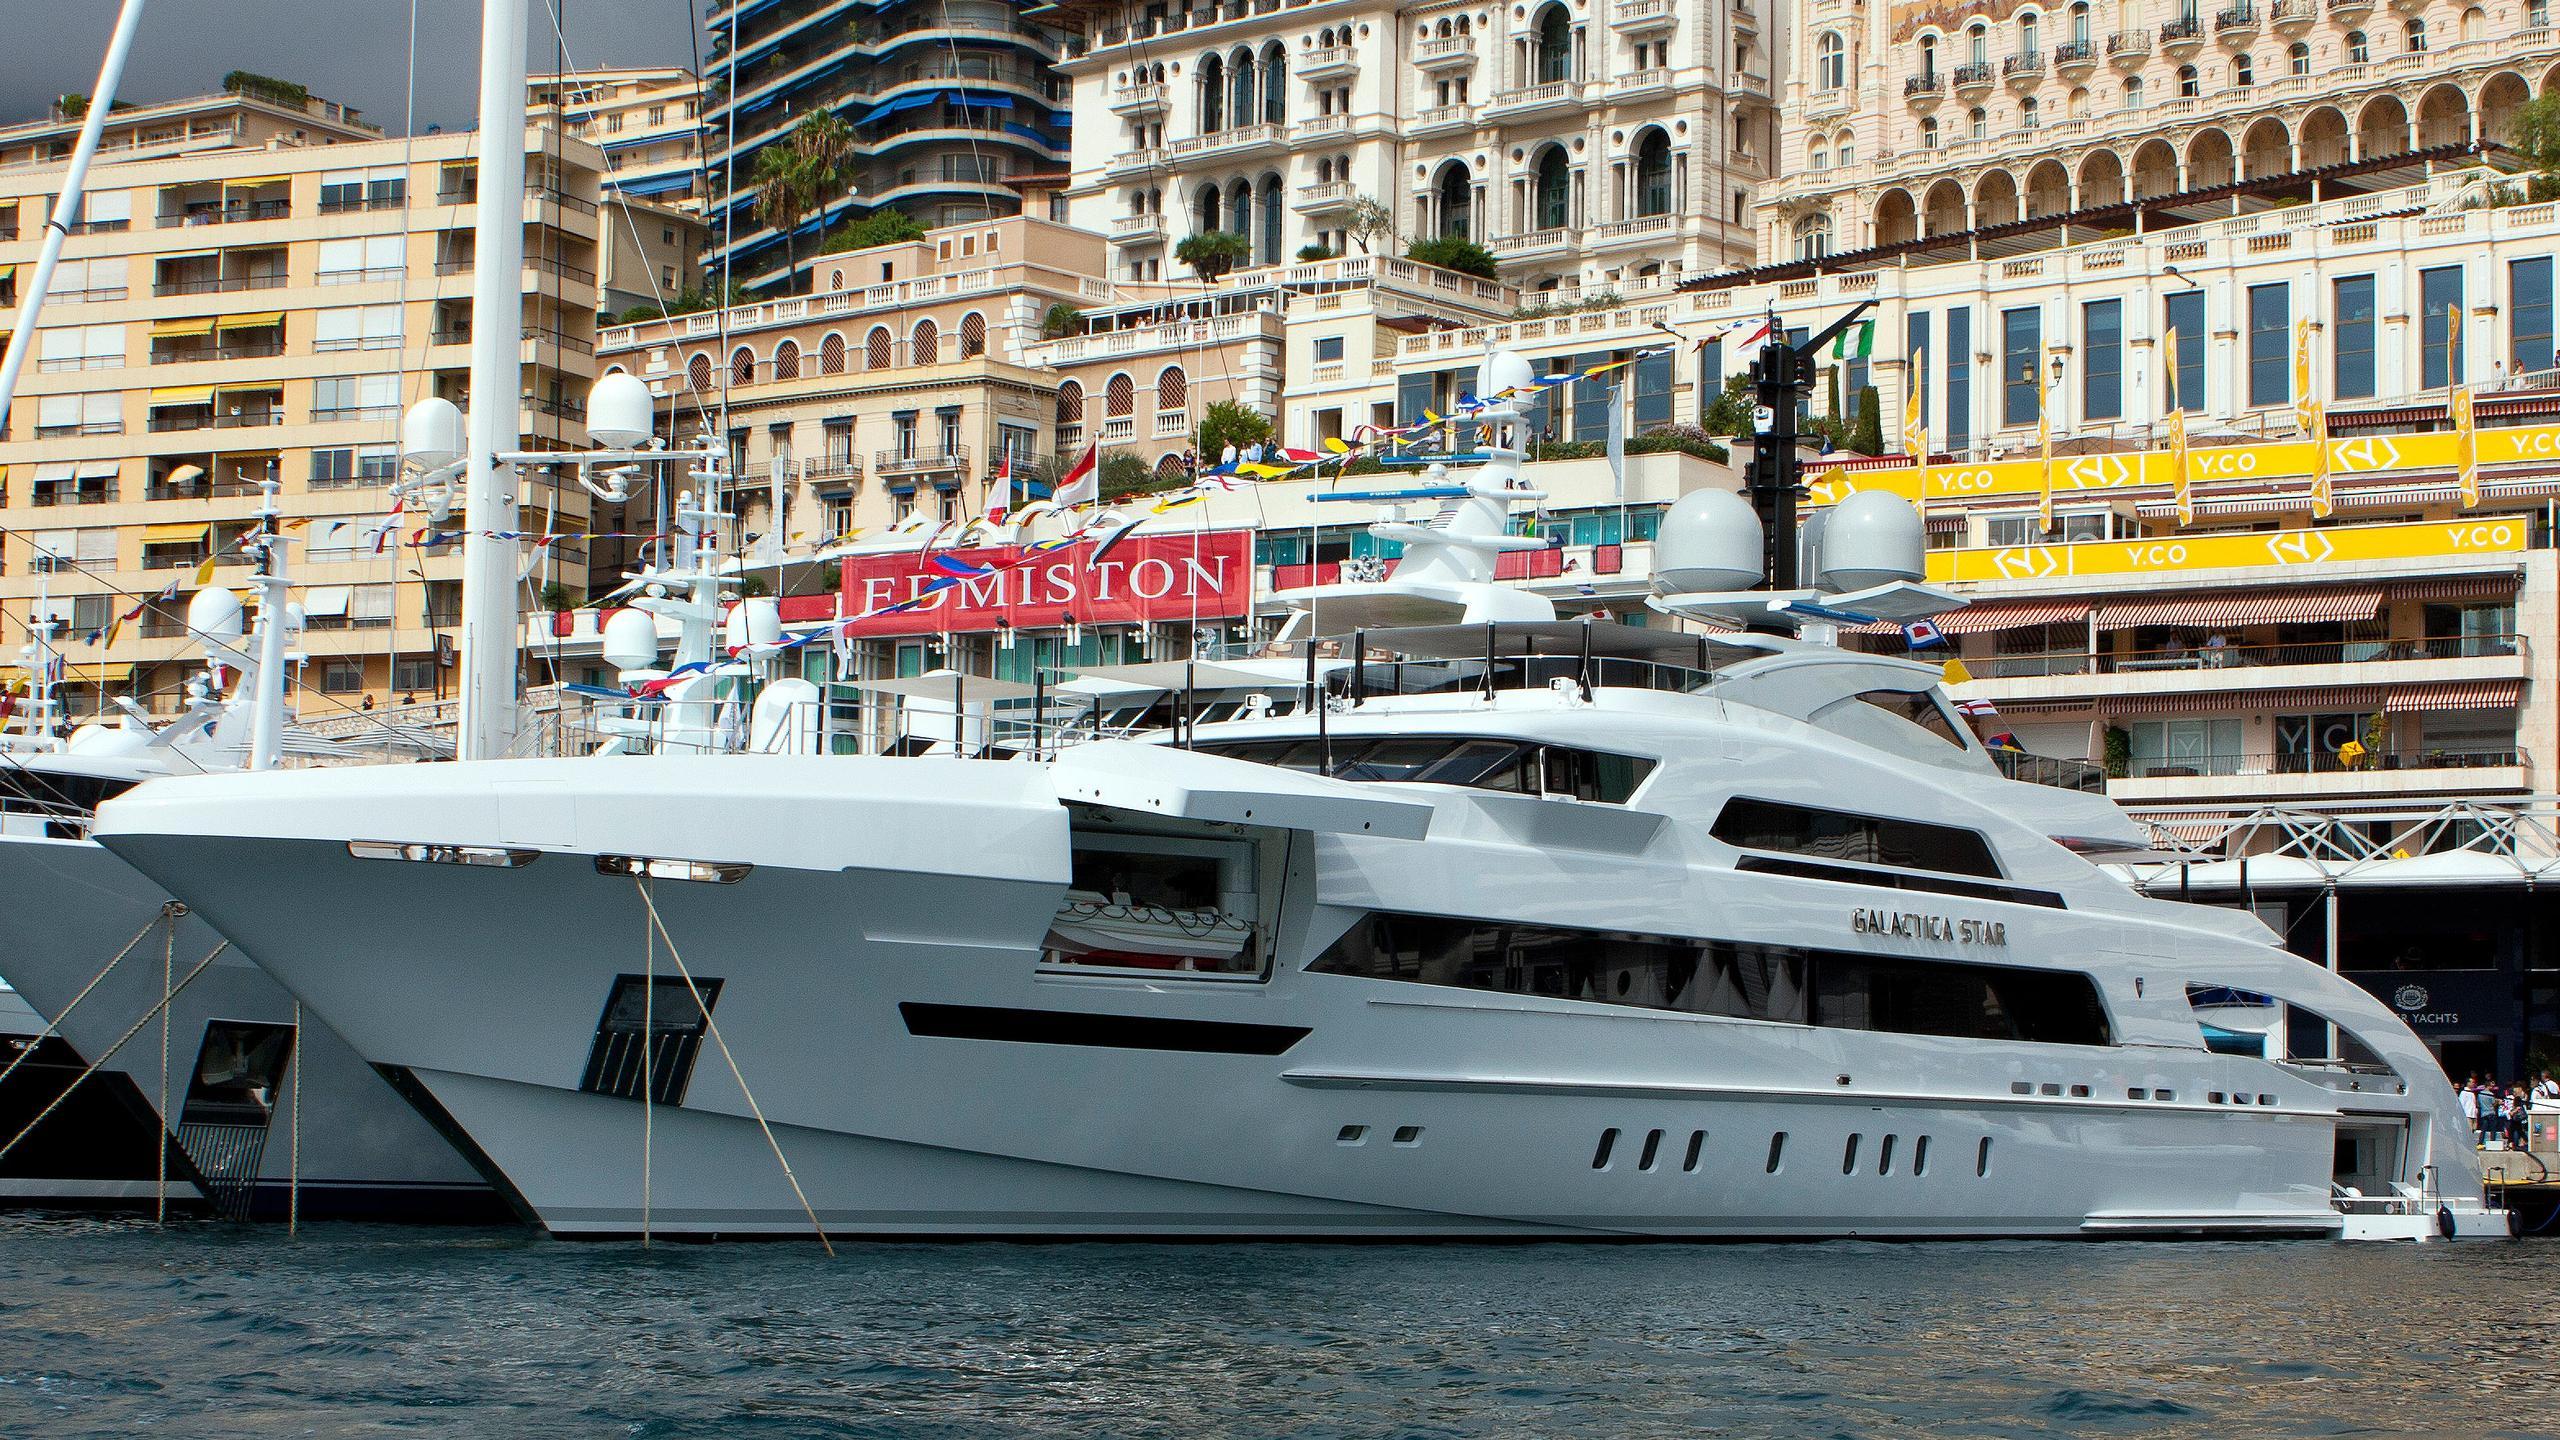 Galactica-Star-motor-yacht-heesen-2013-65m-moored